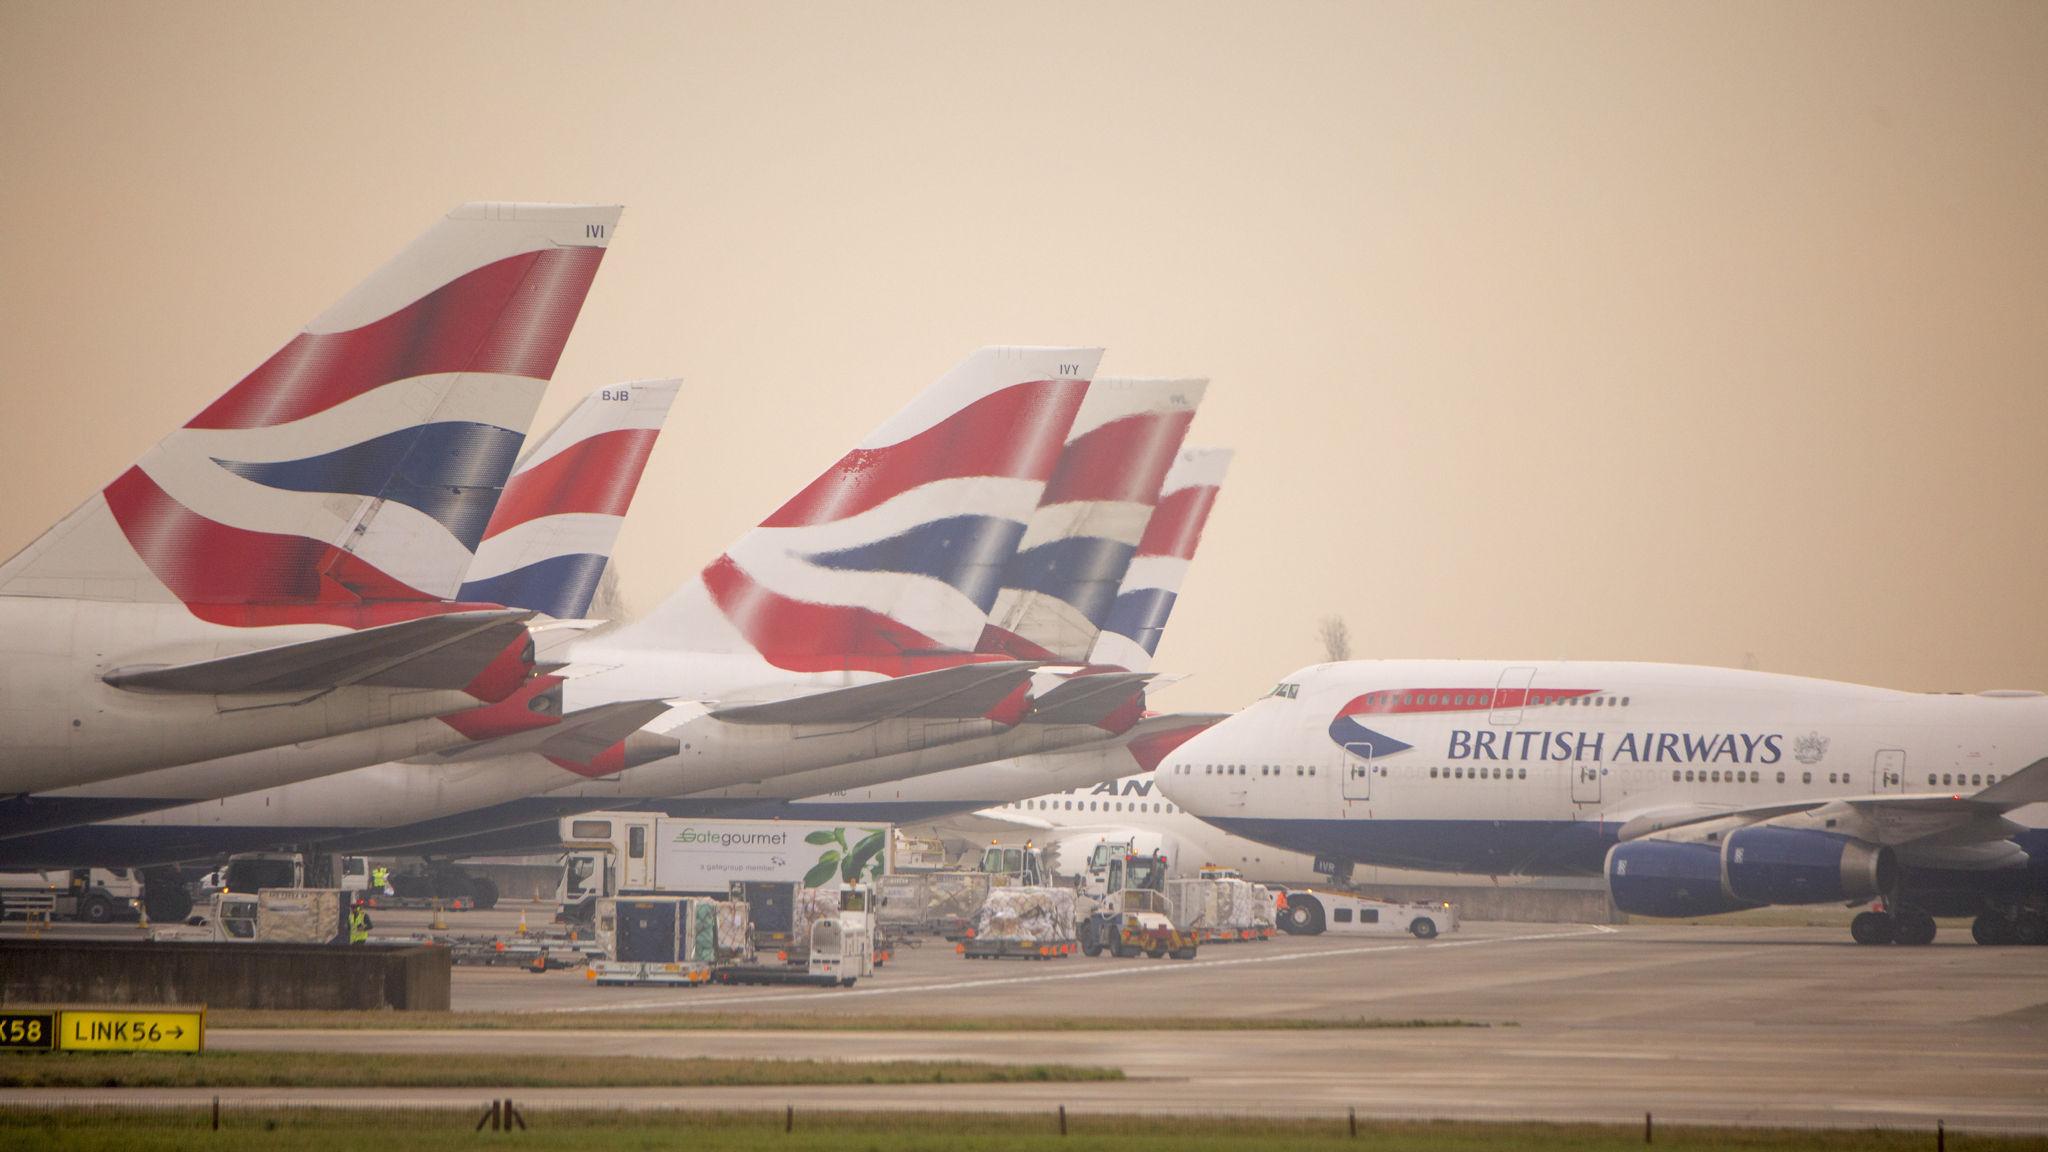 British Airways hit with record £183m fine for data breach